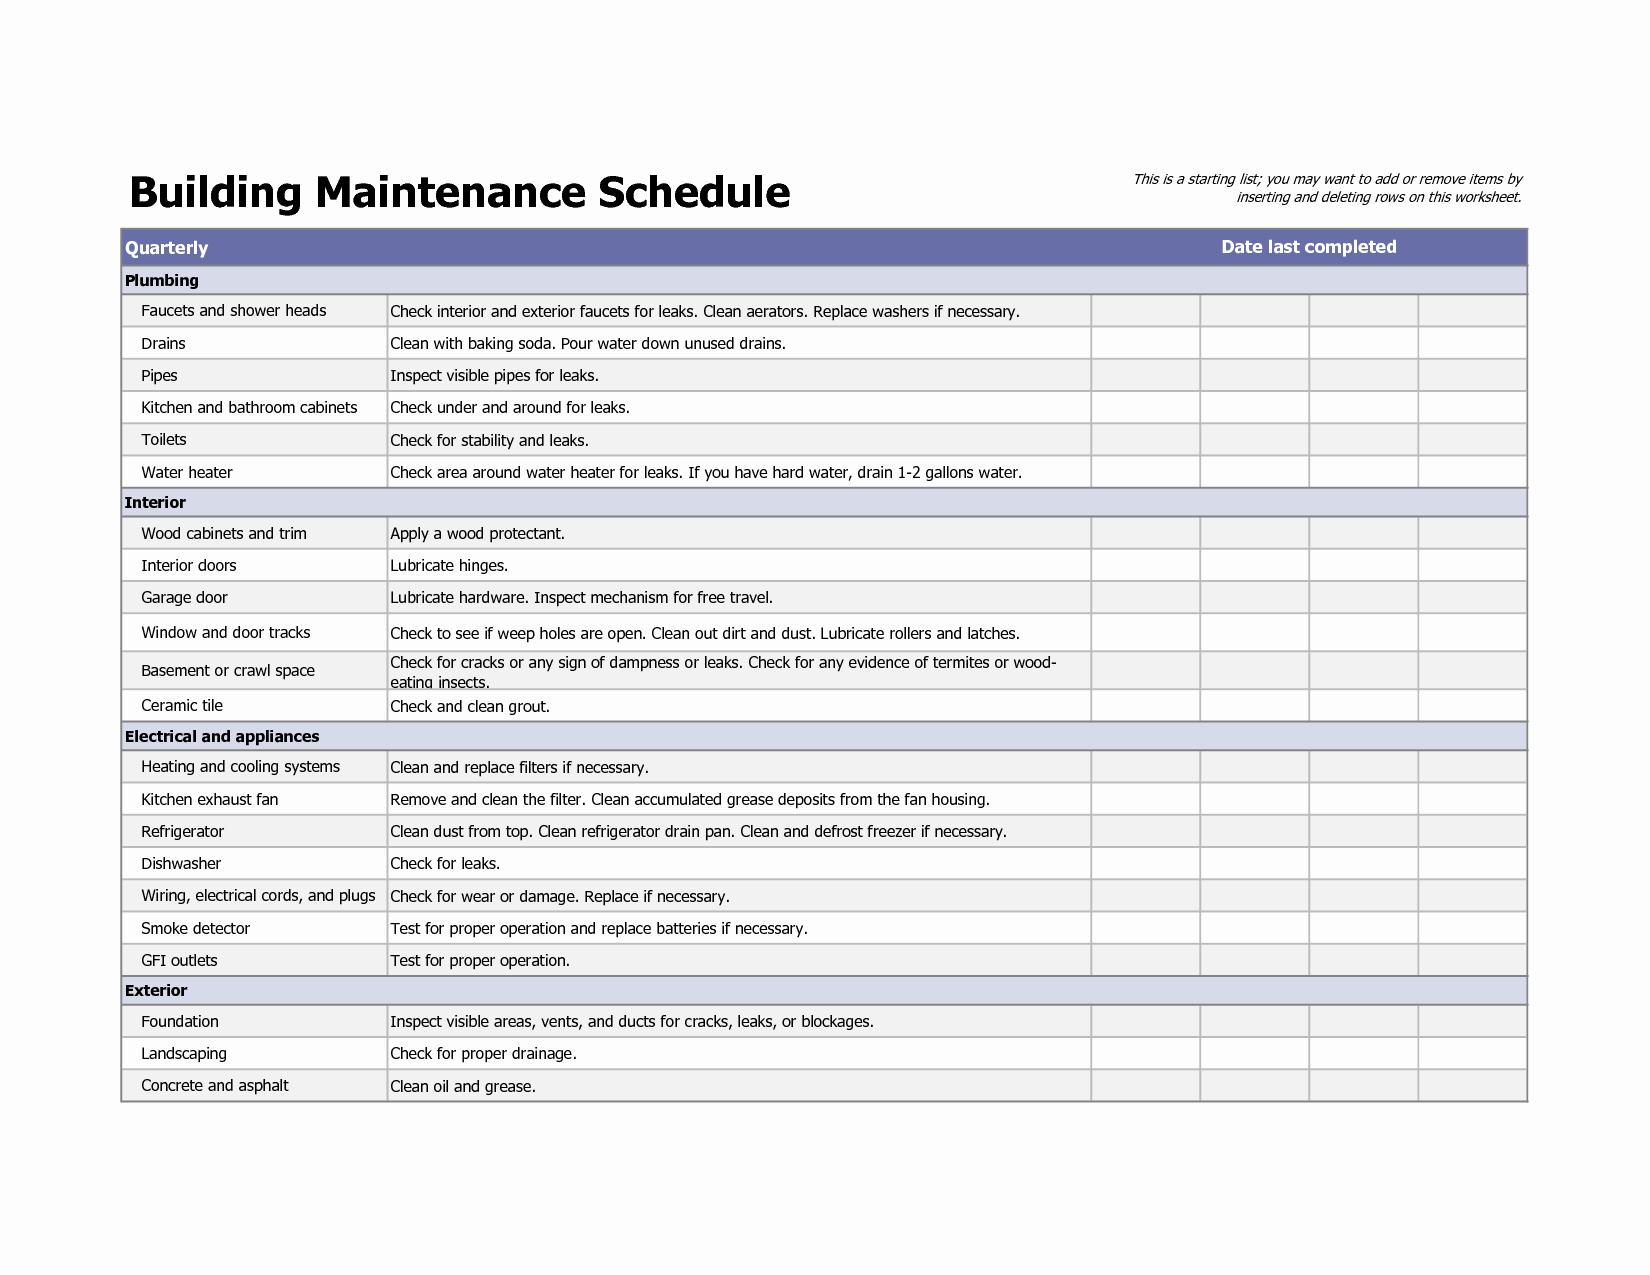 Building Maintenance Schedule Excel Template Beautiful Building Maintenance Schedule Excel Template